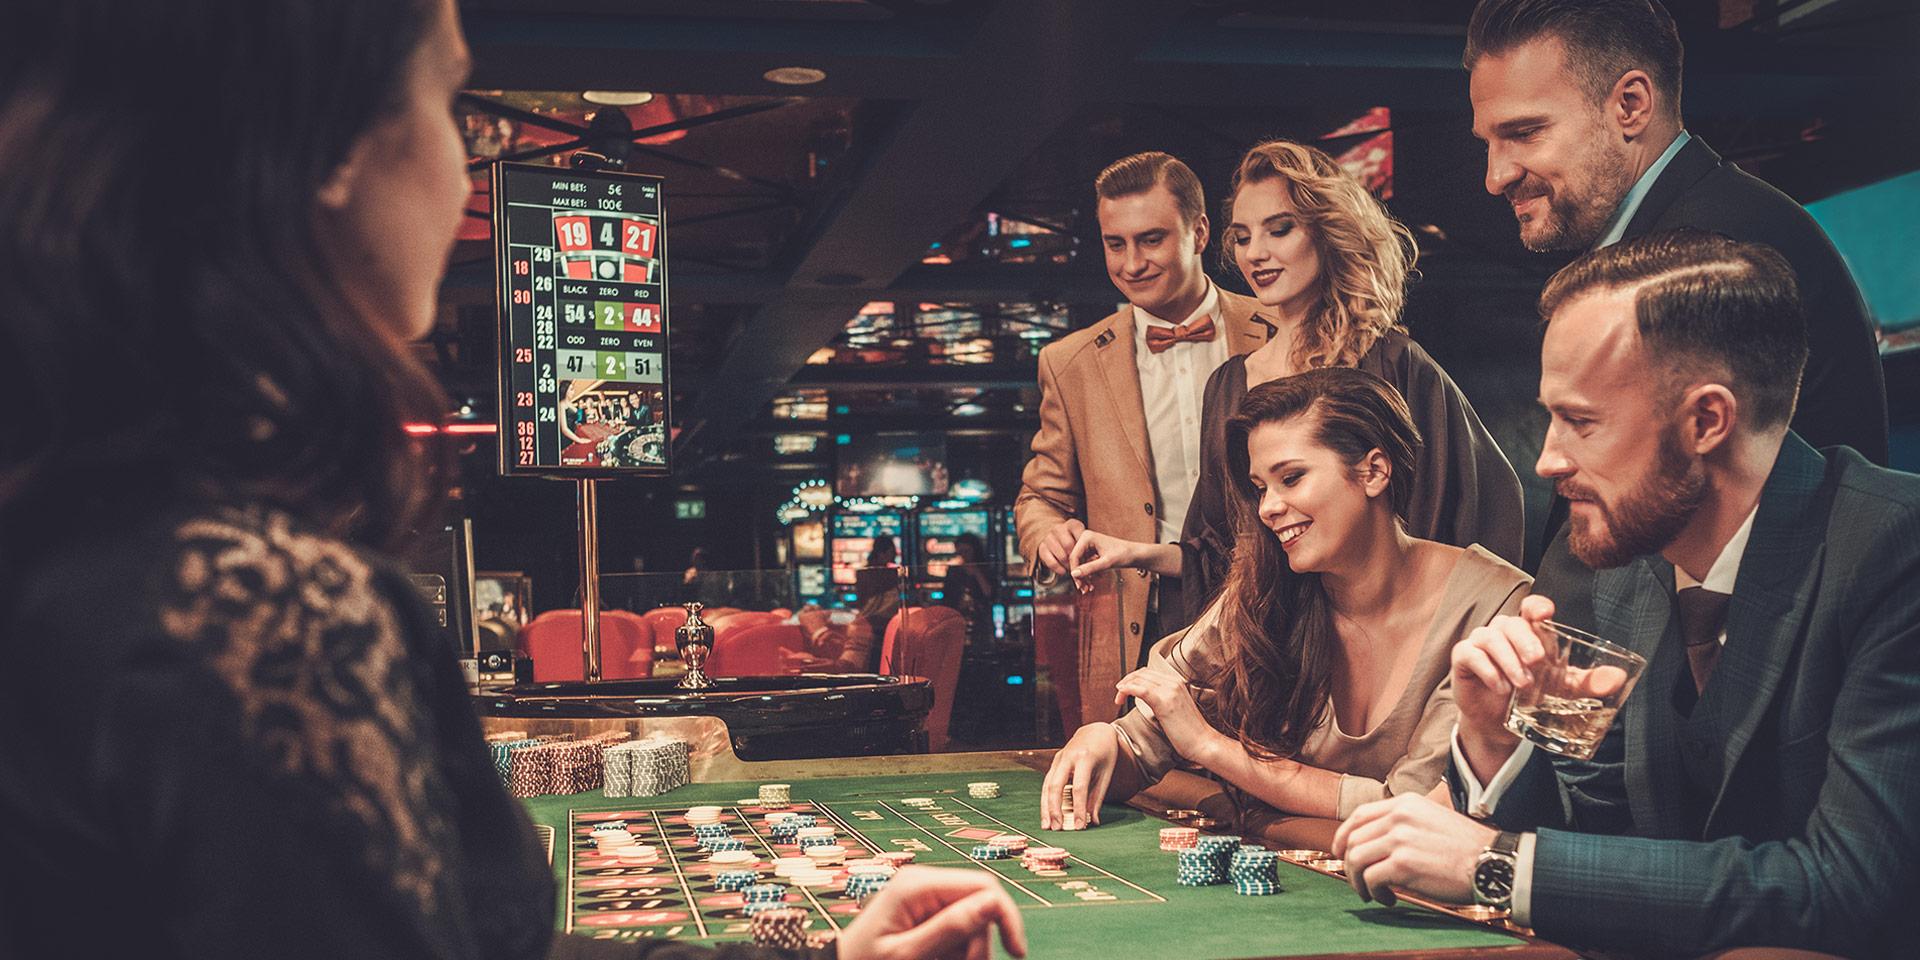 people gambling at a casino